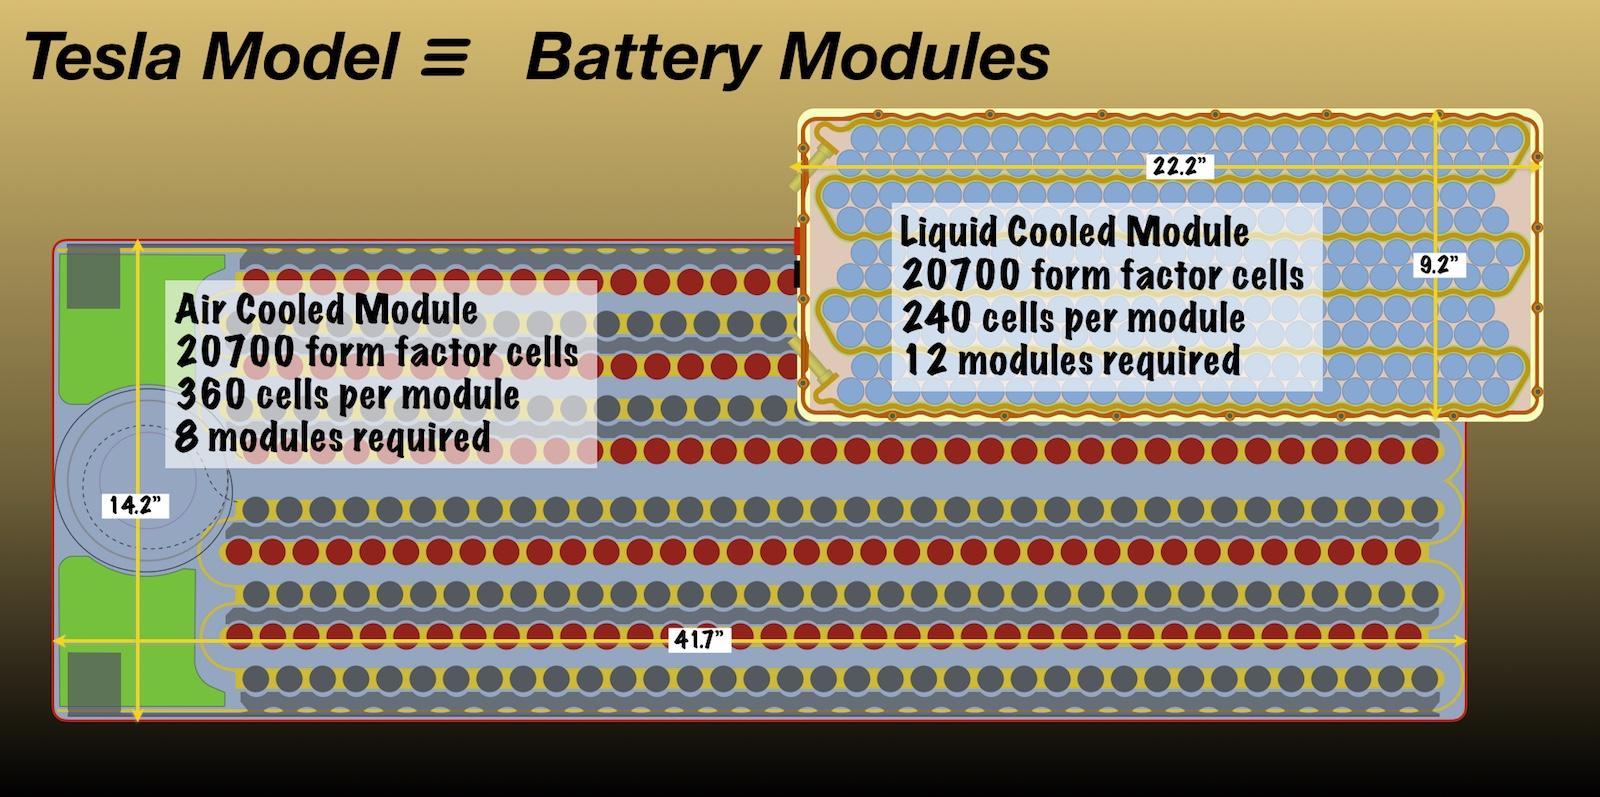 Battery Cell 2170 >> Tesla Model 3 Wins On Innovative Simplicity - Tesla Motors (NASDAQ:TSLA) | Seeking Alpha